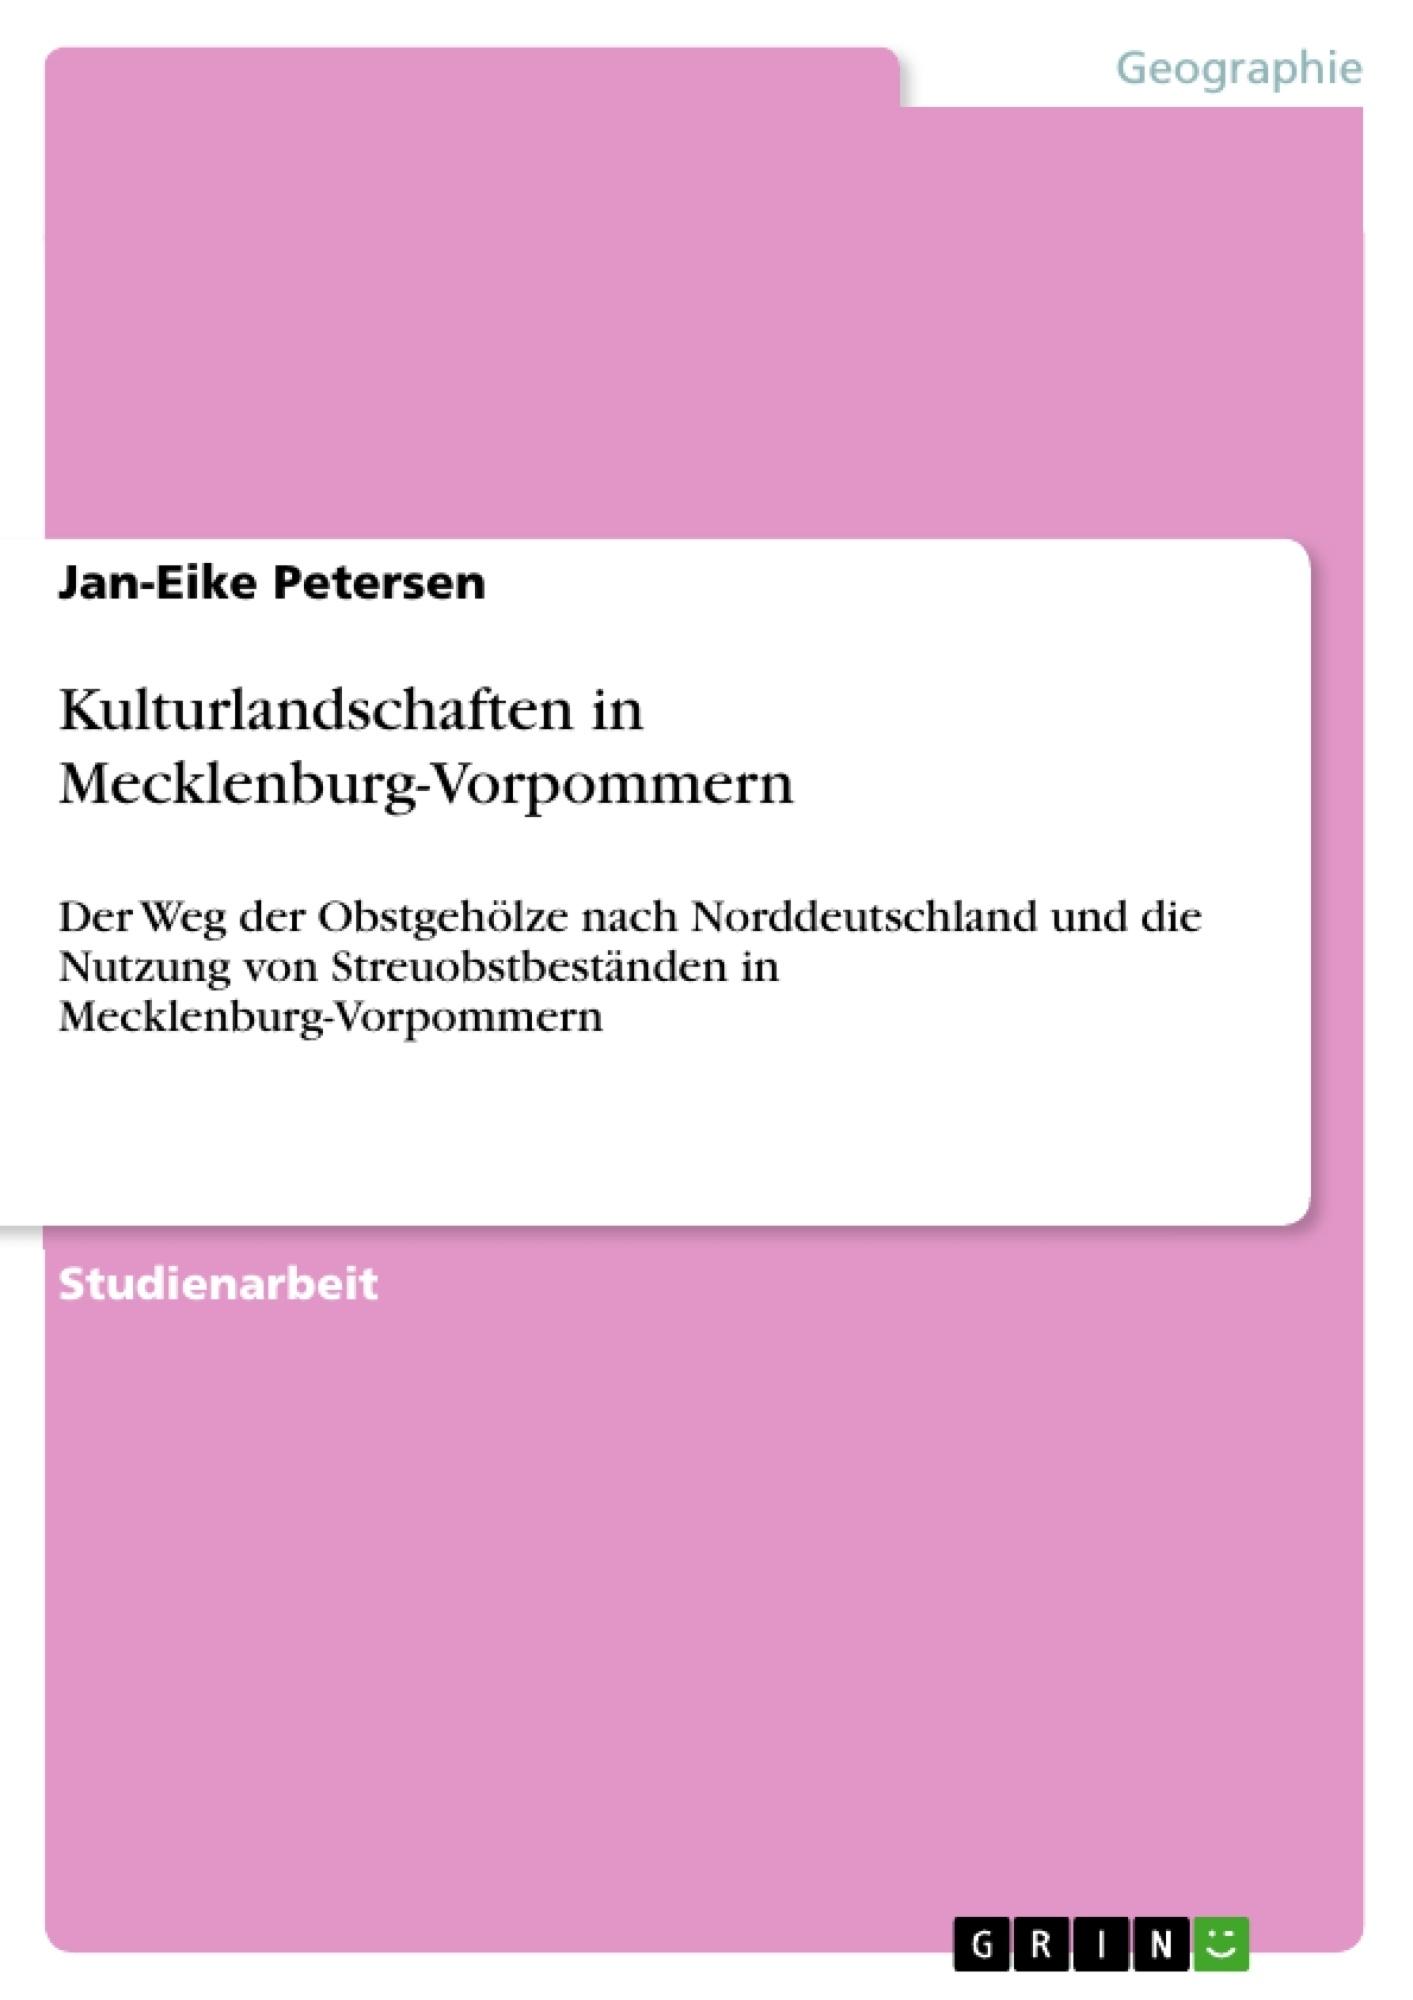 Titel: Kulturlandschaften in Mecklenburg-Vorpommern